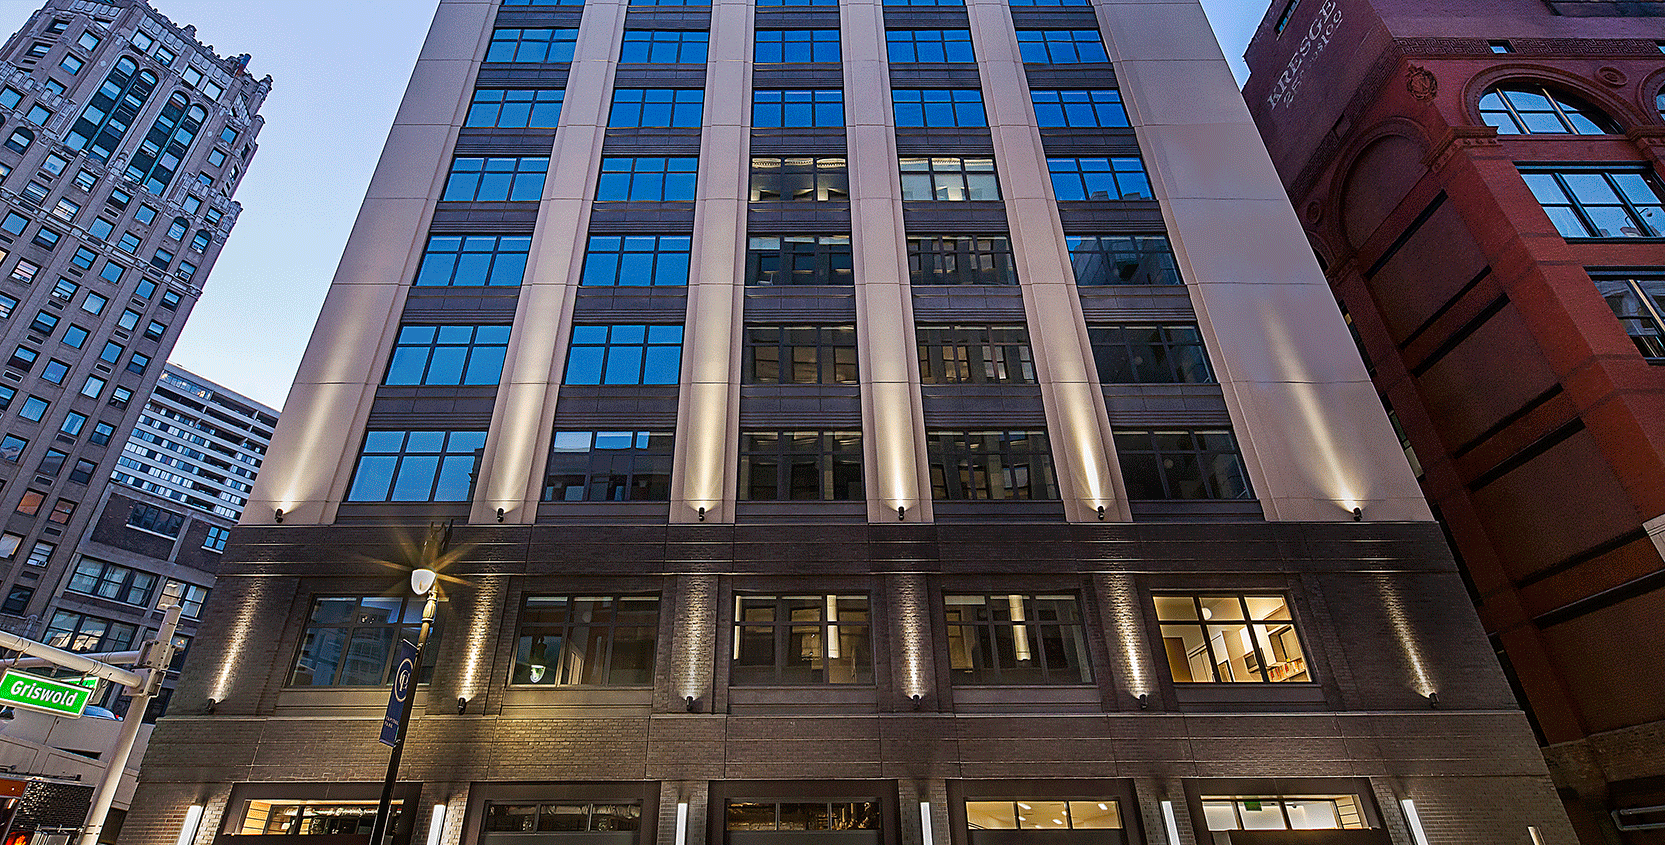 28 W Grand Lofts-Exterior-Facade-Dusk-1665x845